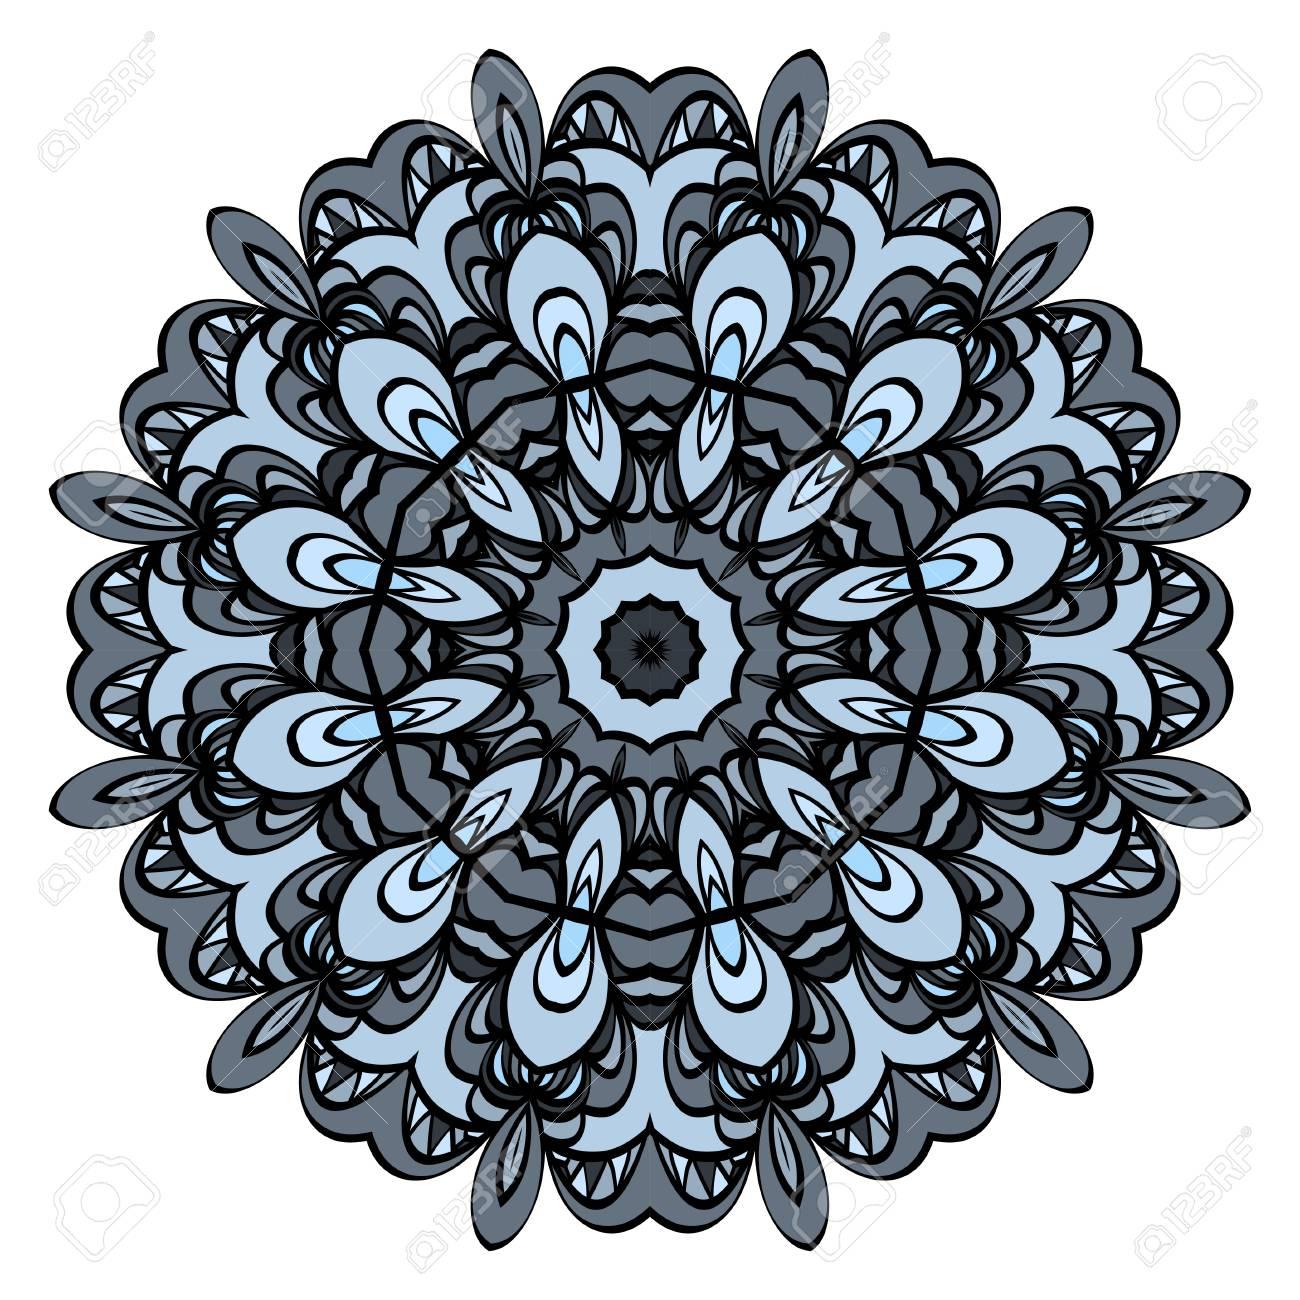 Round floral pattern  Decorative coloring Mandala  Design element